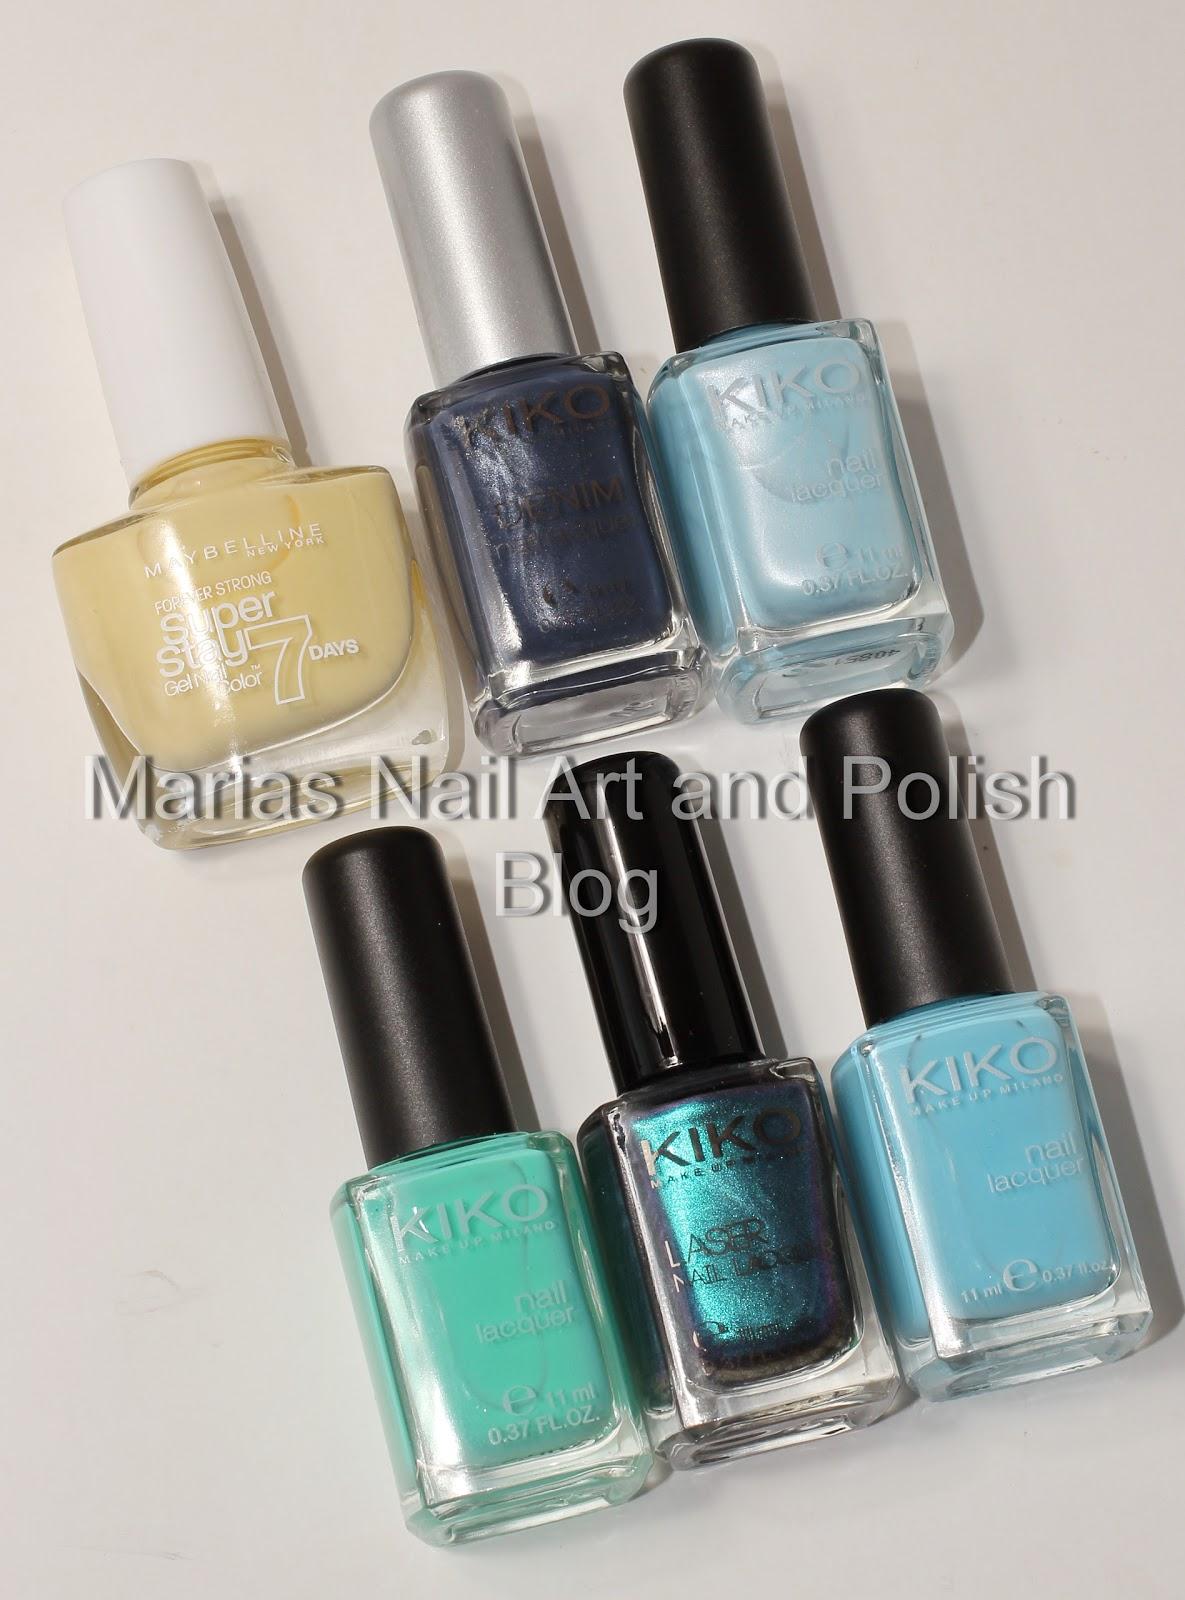 Marias Nail Art and Polish Blog: An Italian Polish Fairy paid me a ...